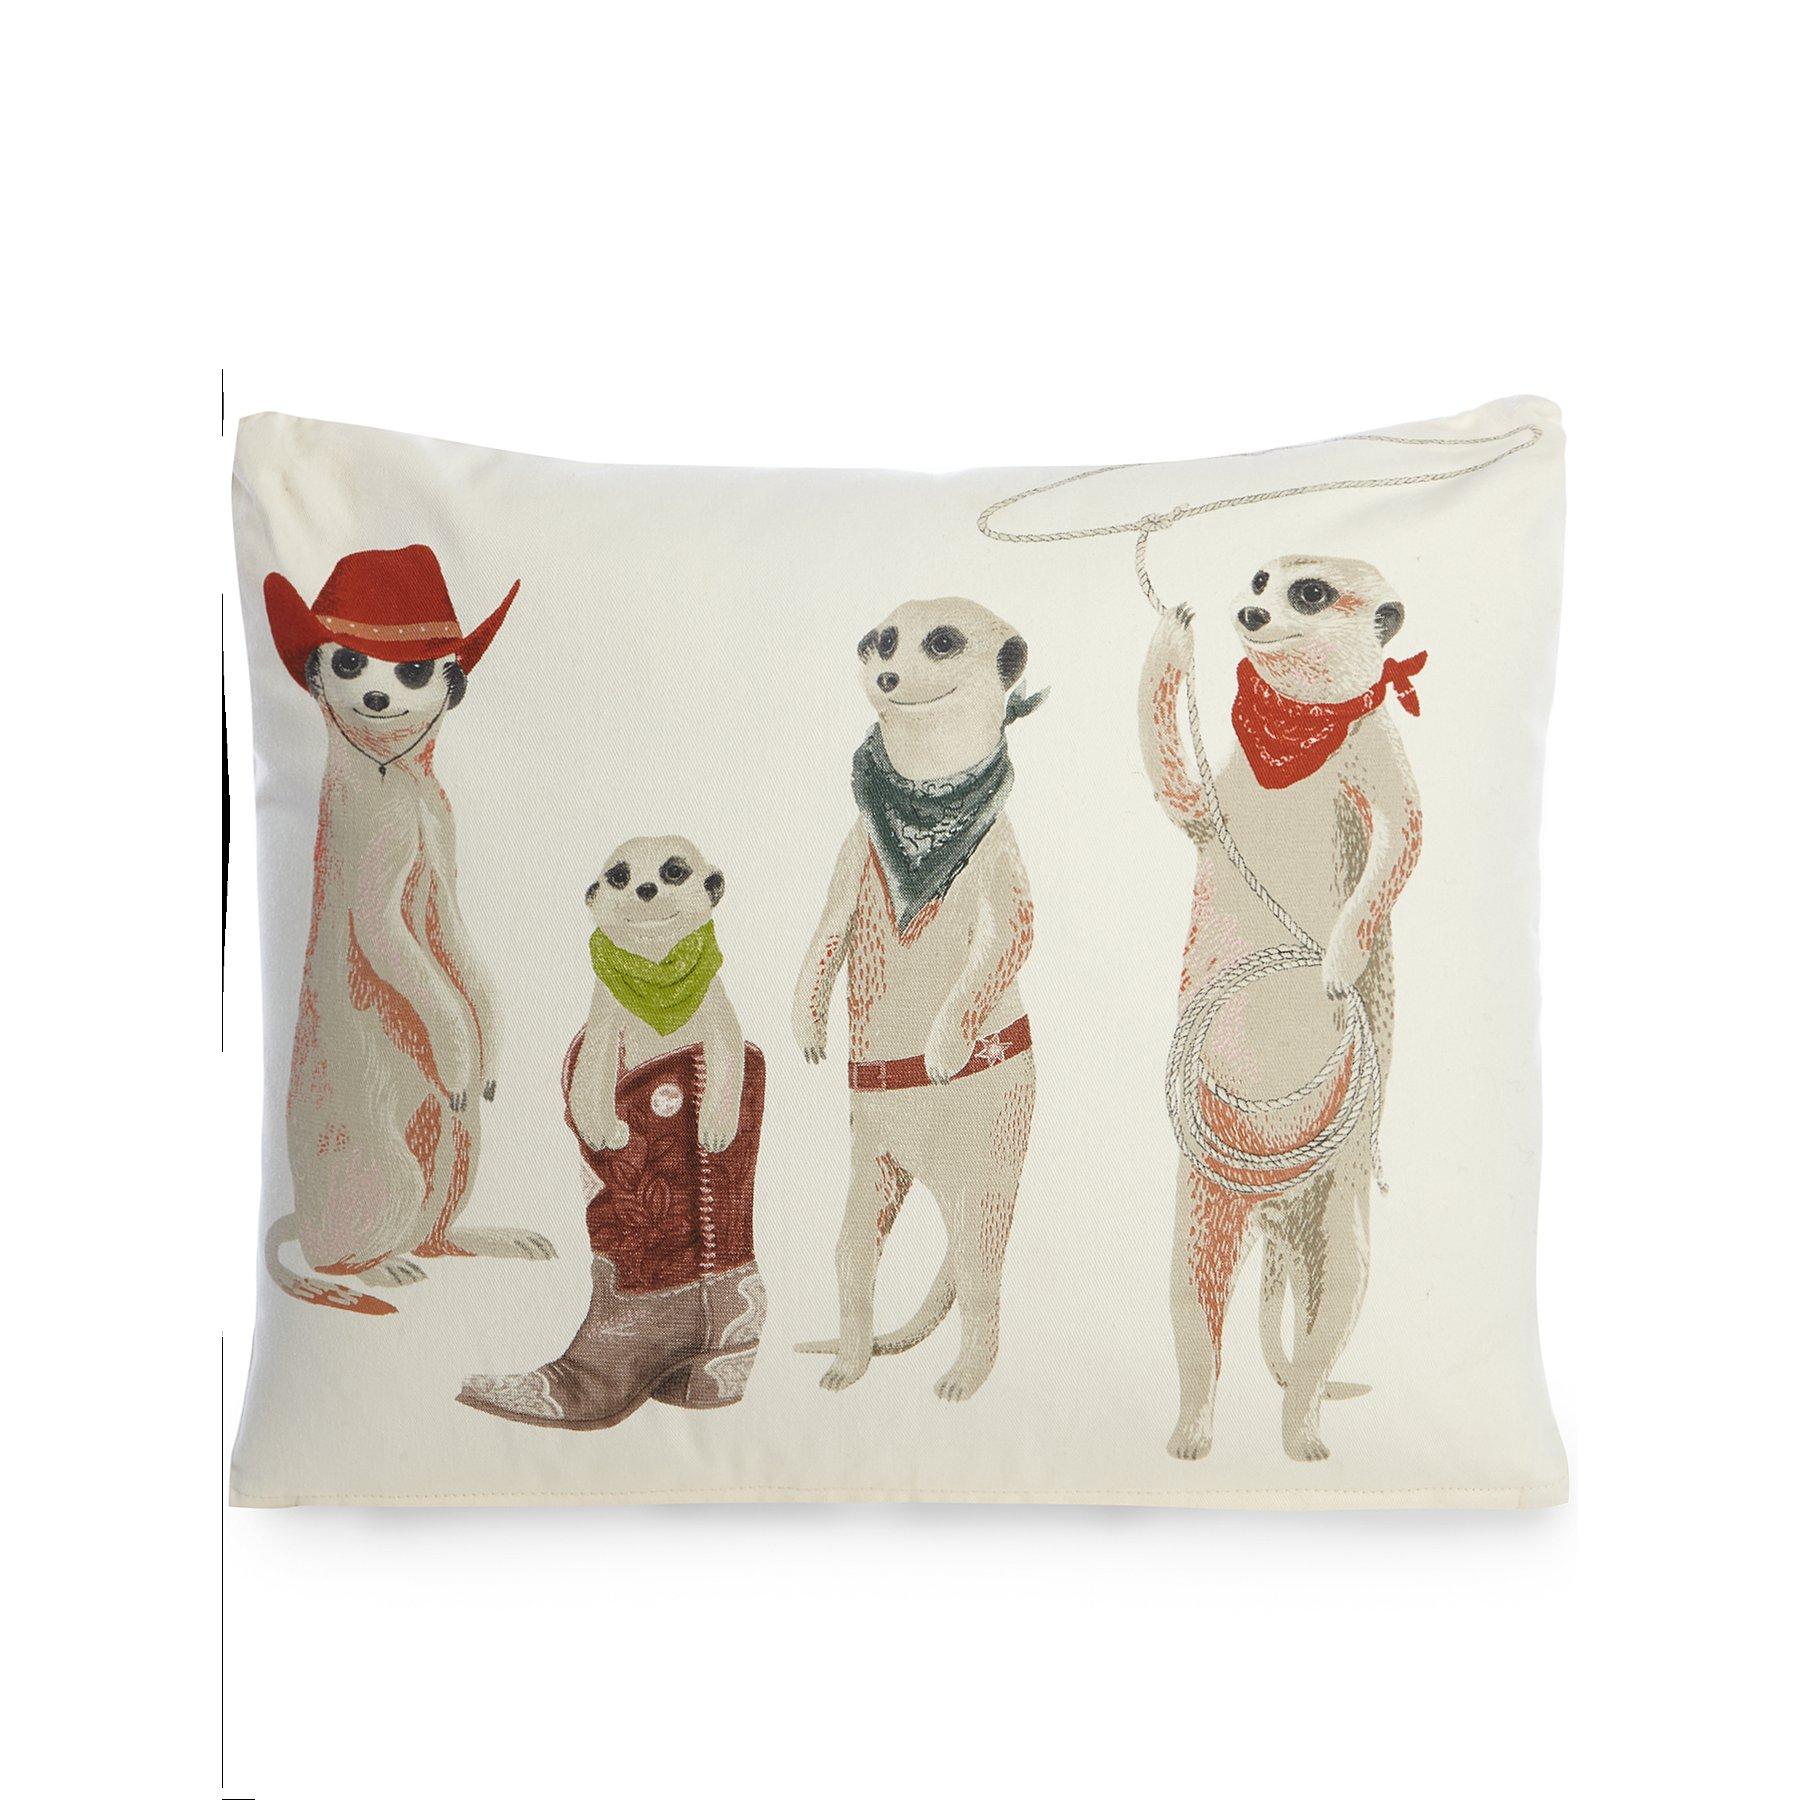 Meerkat Cowboy Print Cushion, Now £4.20 @ Asda ( Free C&C )